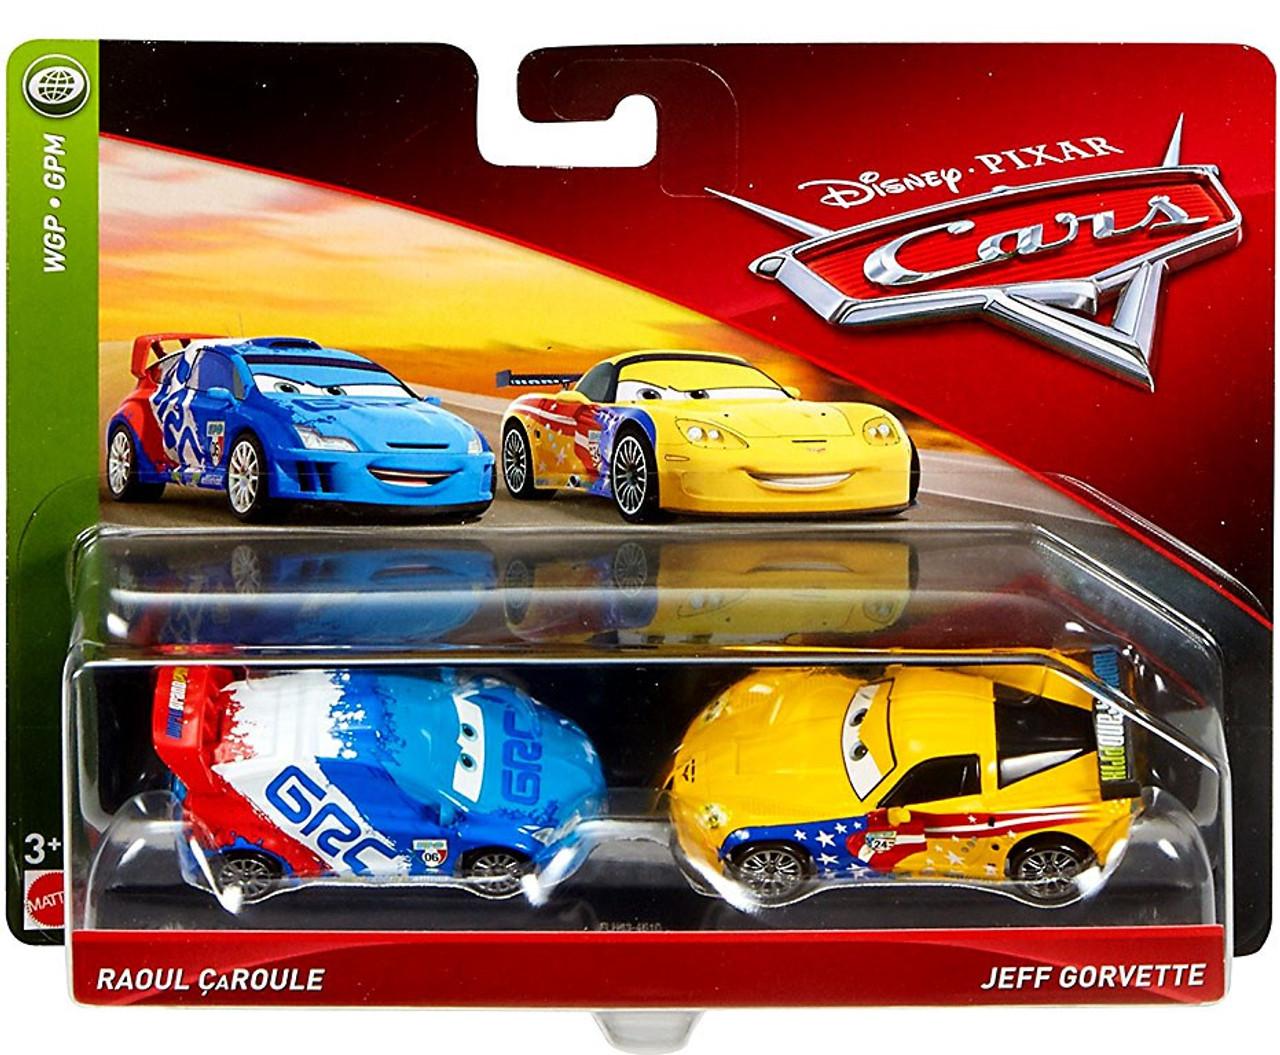 Disney Pixar Cars Cars 3 Wgp Raoul Caroule Jeff Gorvette 155 Diecast